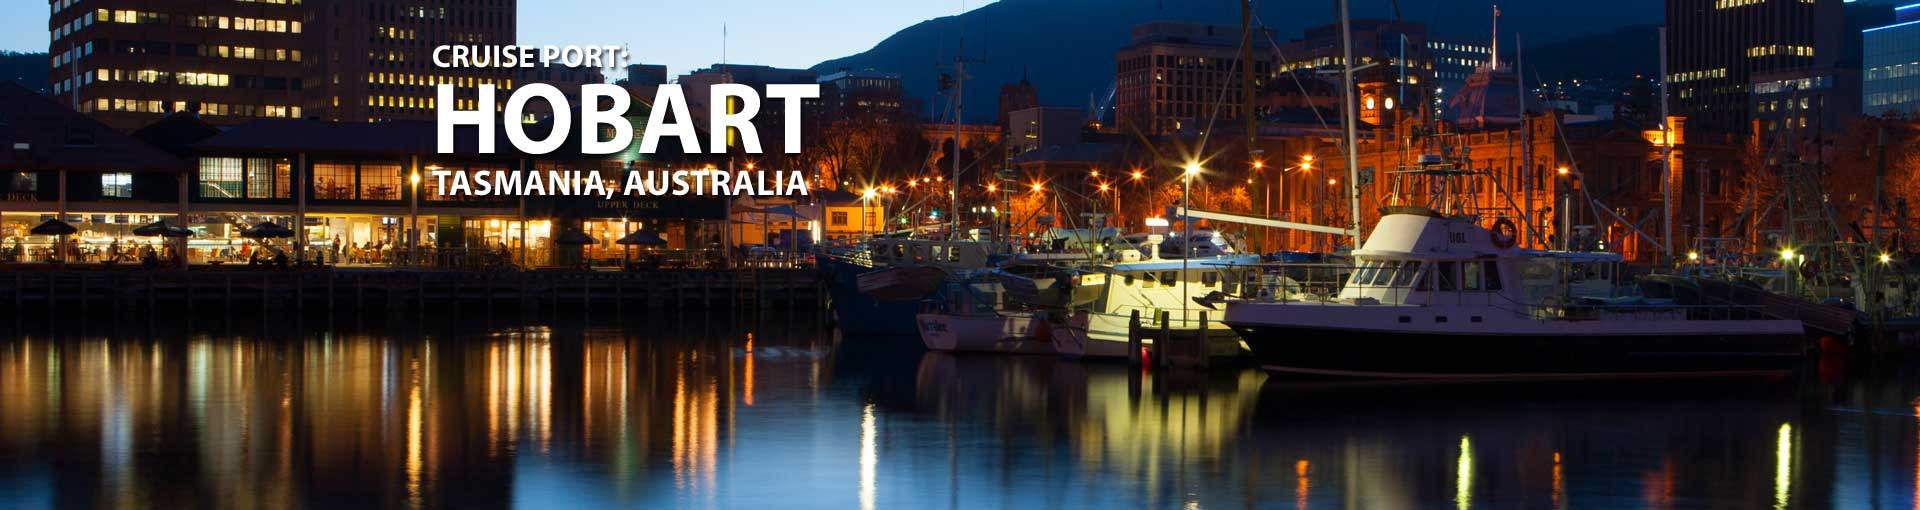 Cruises to Hobart, Tasmania Australia